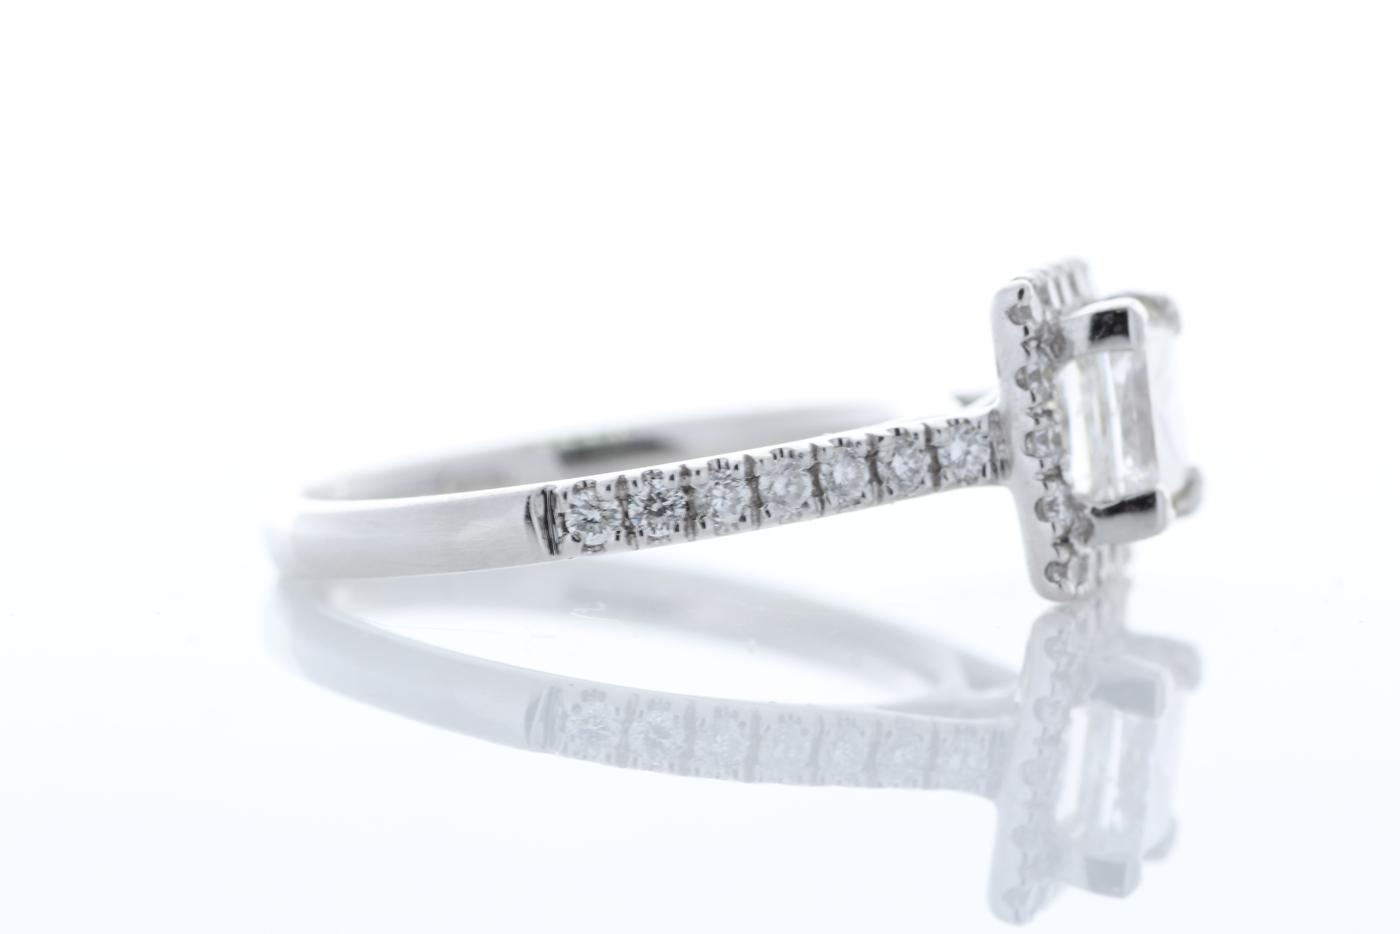 18ct White Gold Halo Set Princess Cut Diamond Ring 1.36 Carats - Image 4 of 6